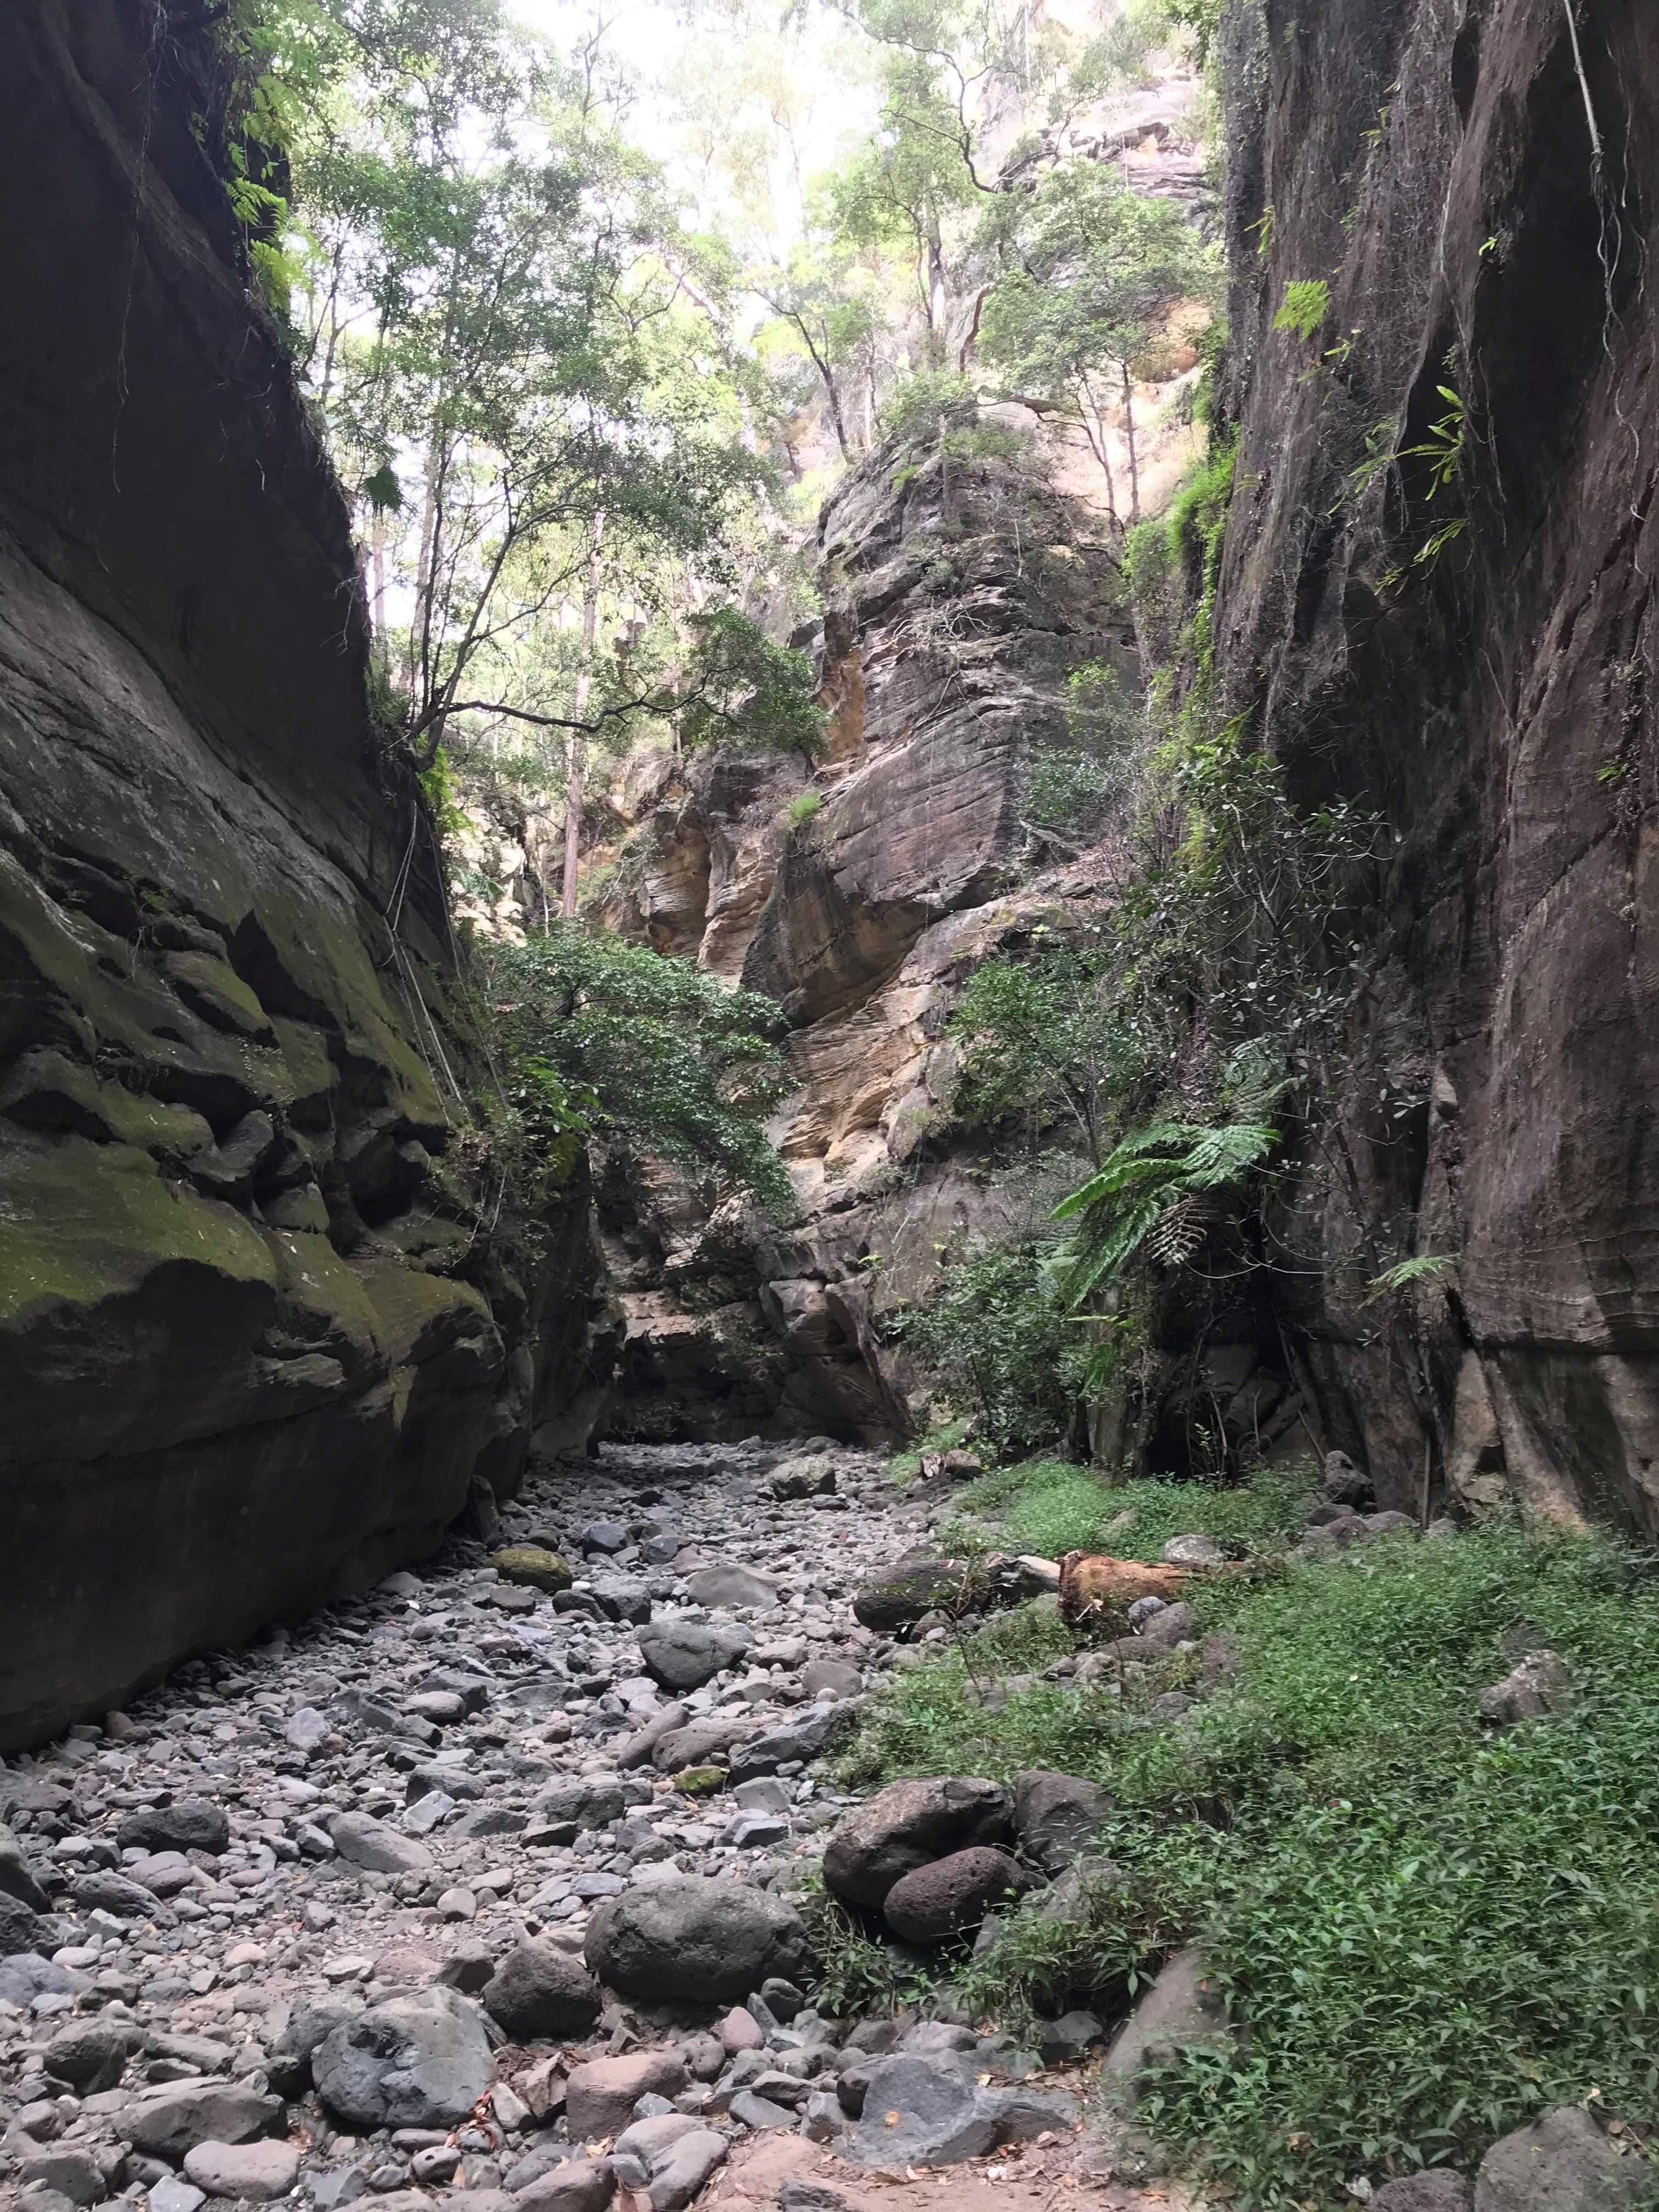 rock formations in carnarvon gorge national park in outback queensland australia